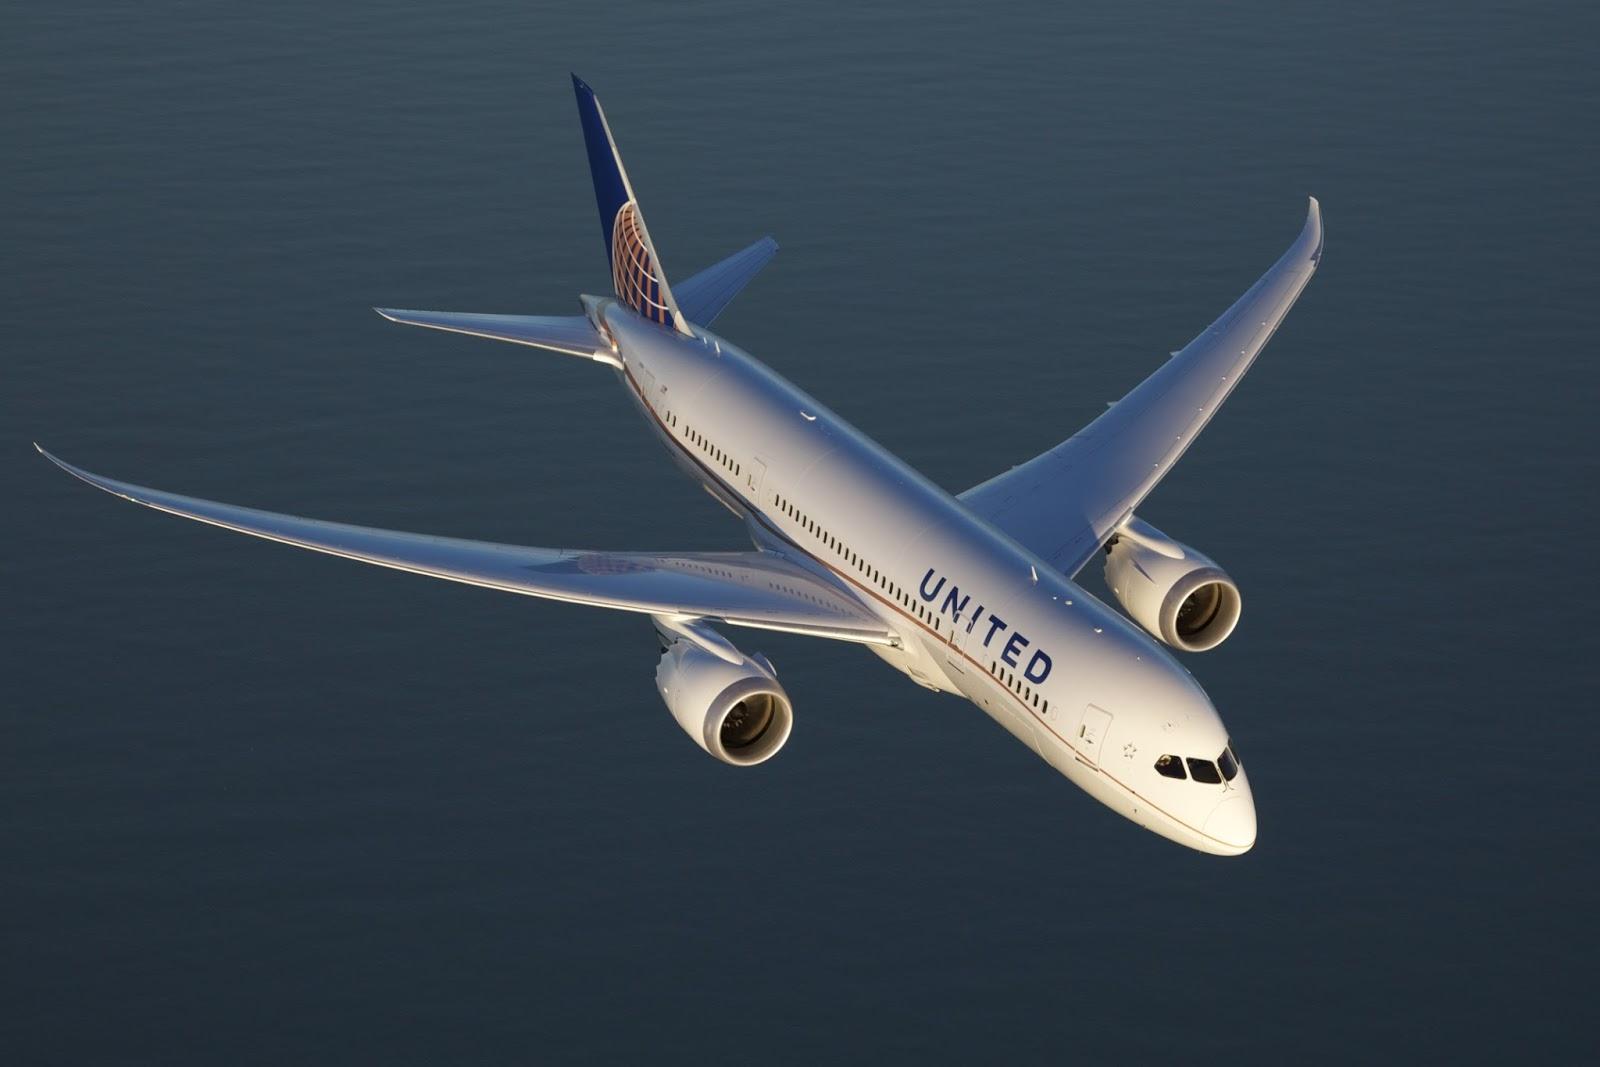 United announces LAX – Melbourne 787-9 non-stop service